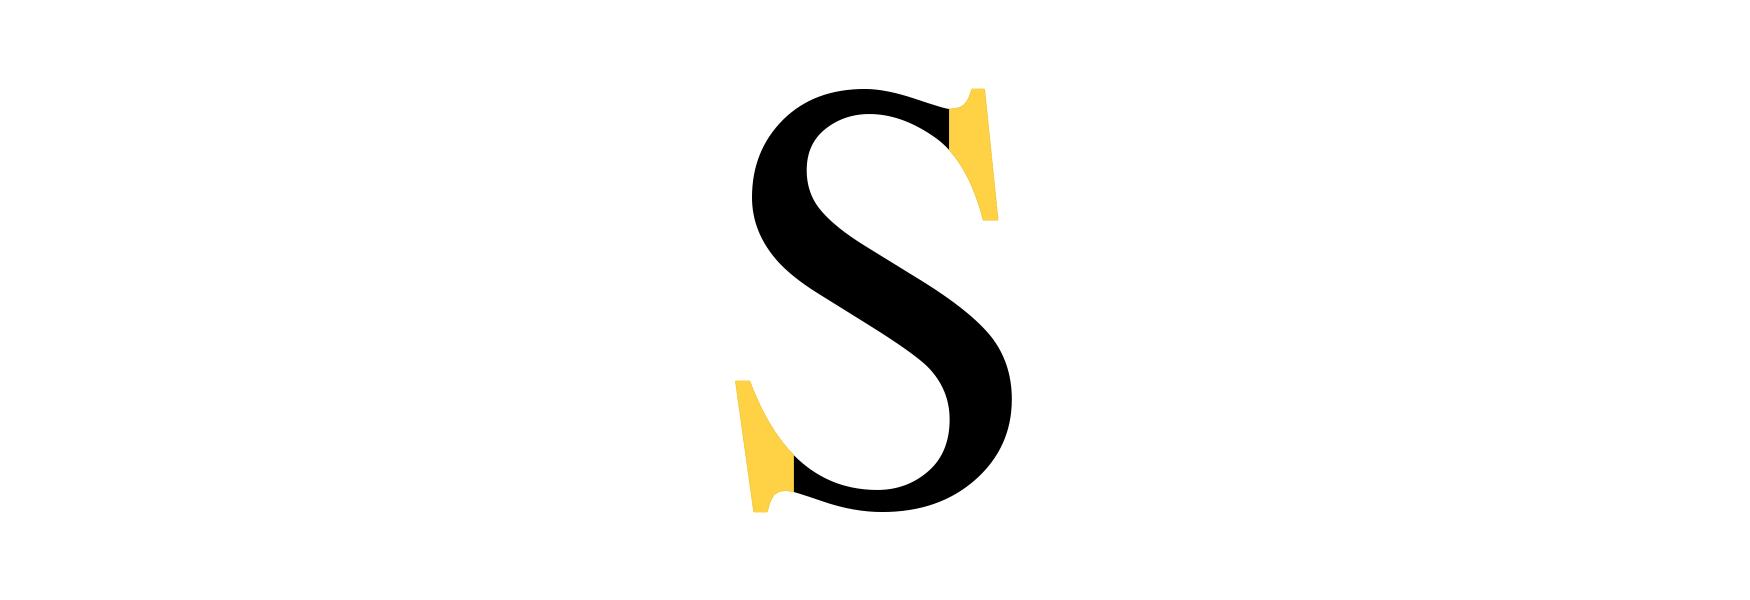 Designagentur-Stuttgart-Kreativbetrieb-Design-Lexikon-Serifen-1